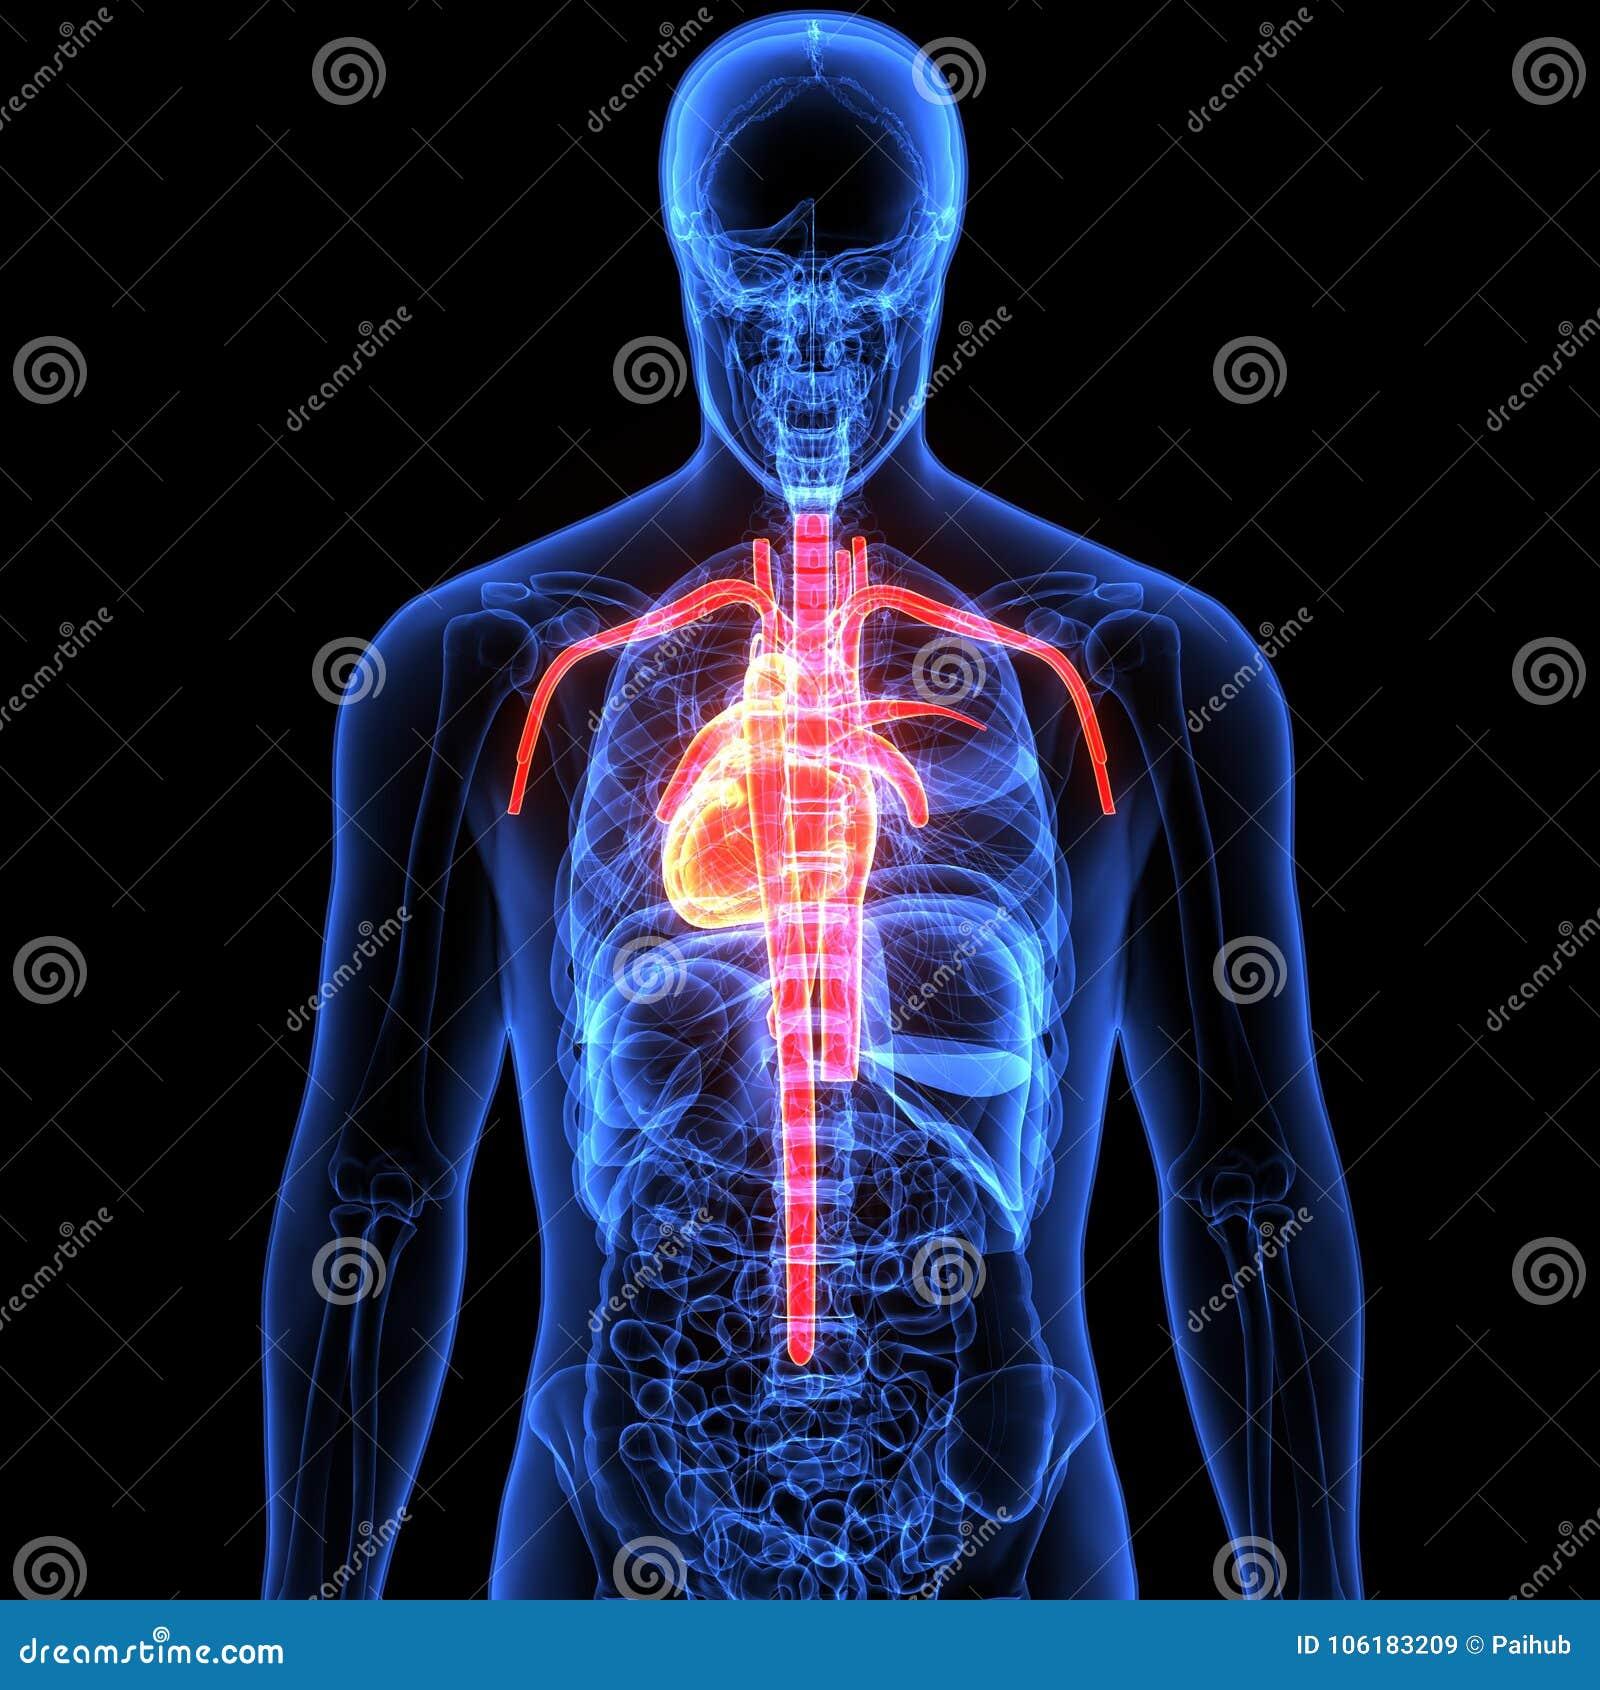 3d Illustration Of Human Body Heart Anatomy Stock Illustration ...